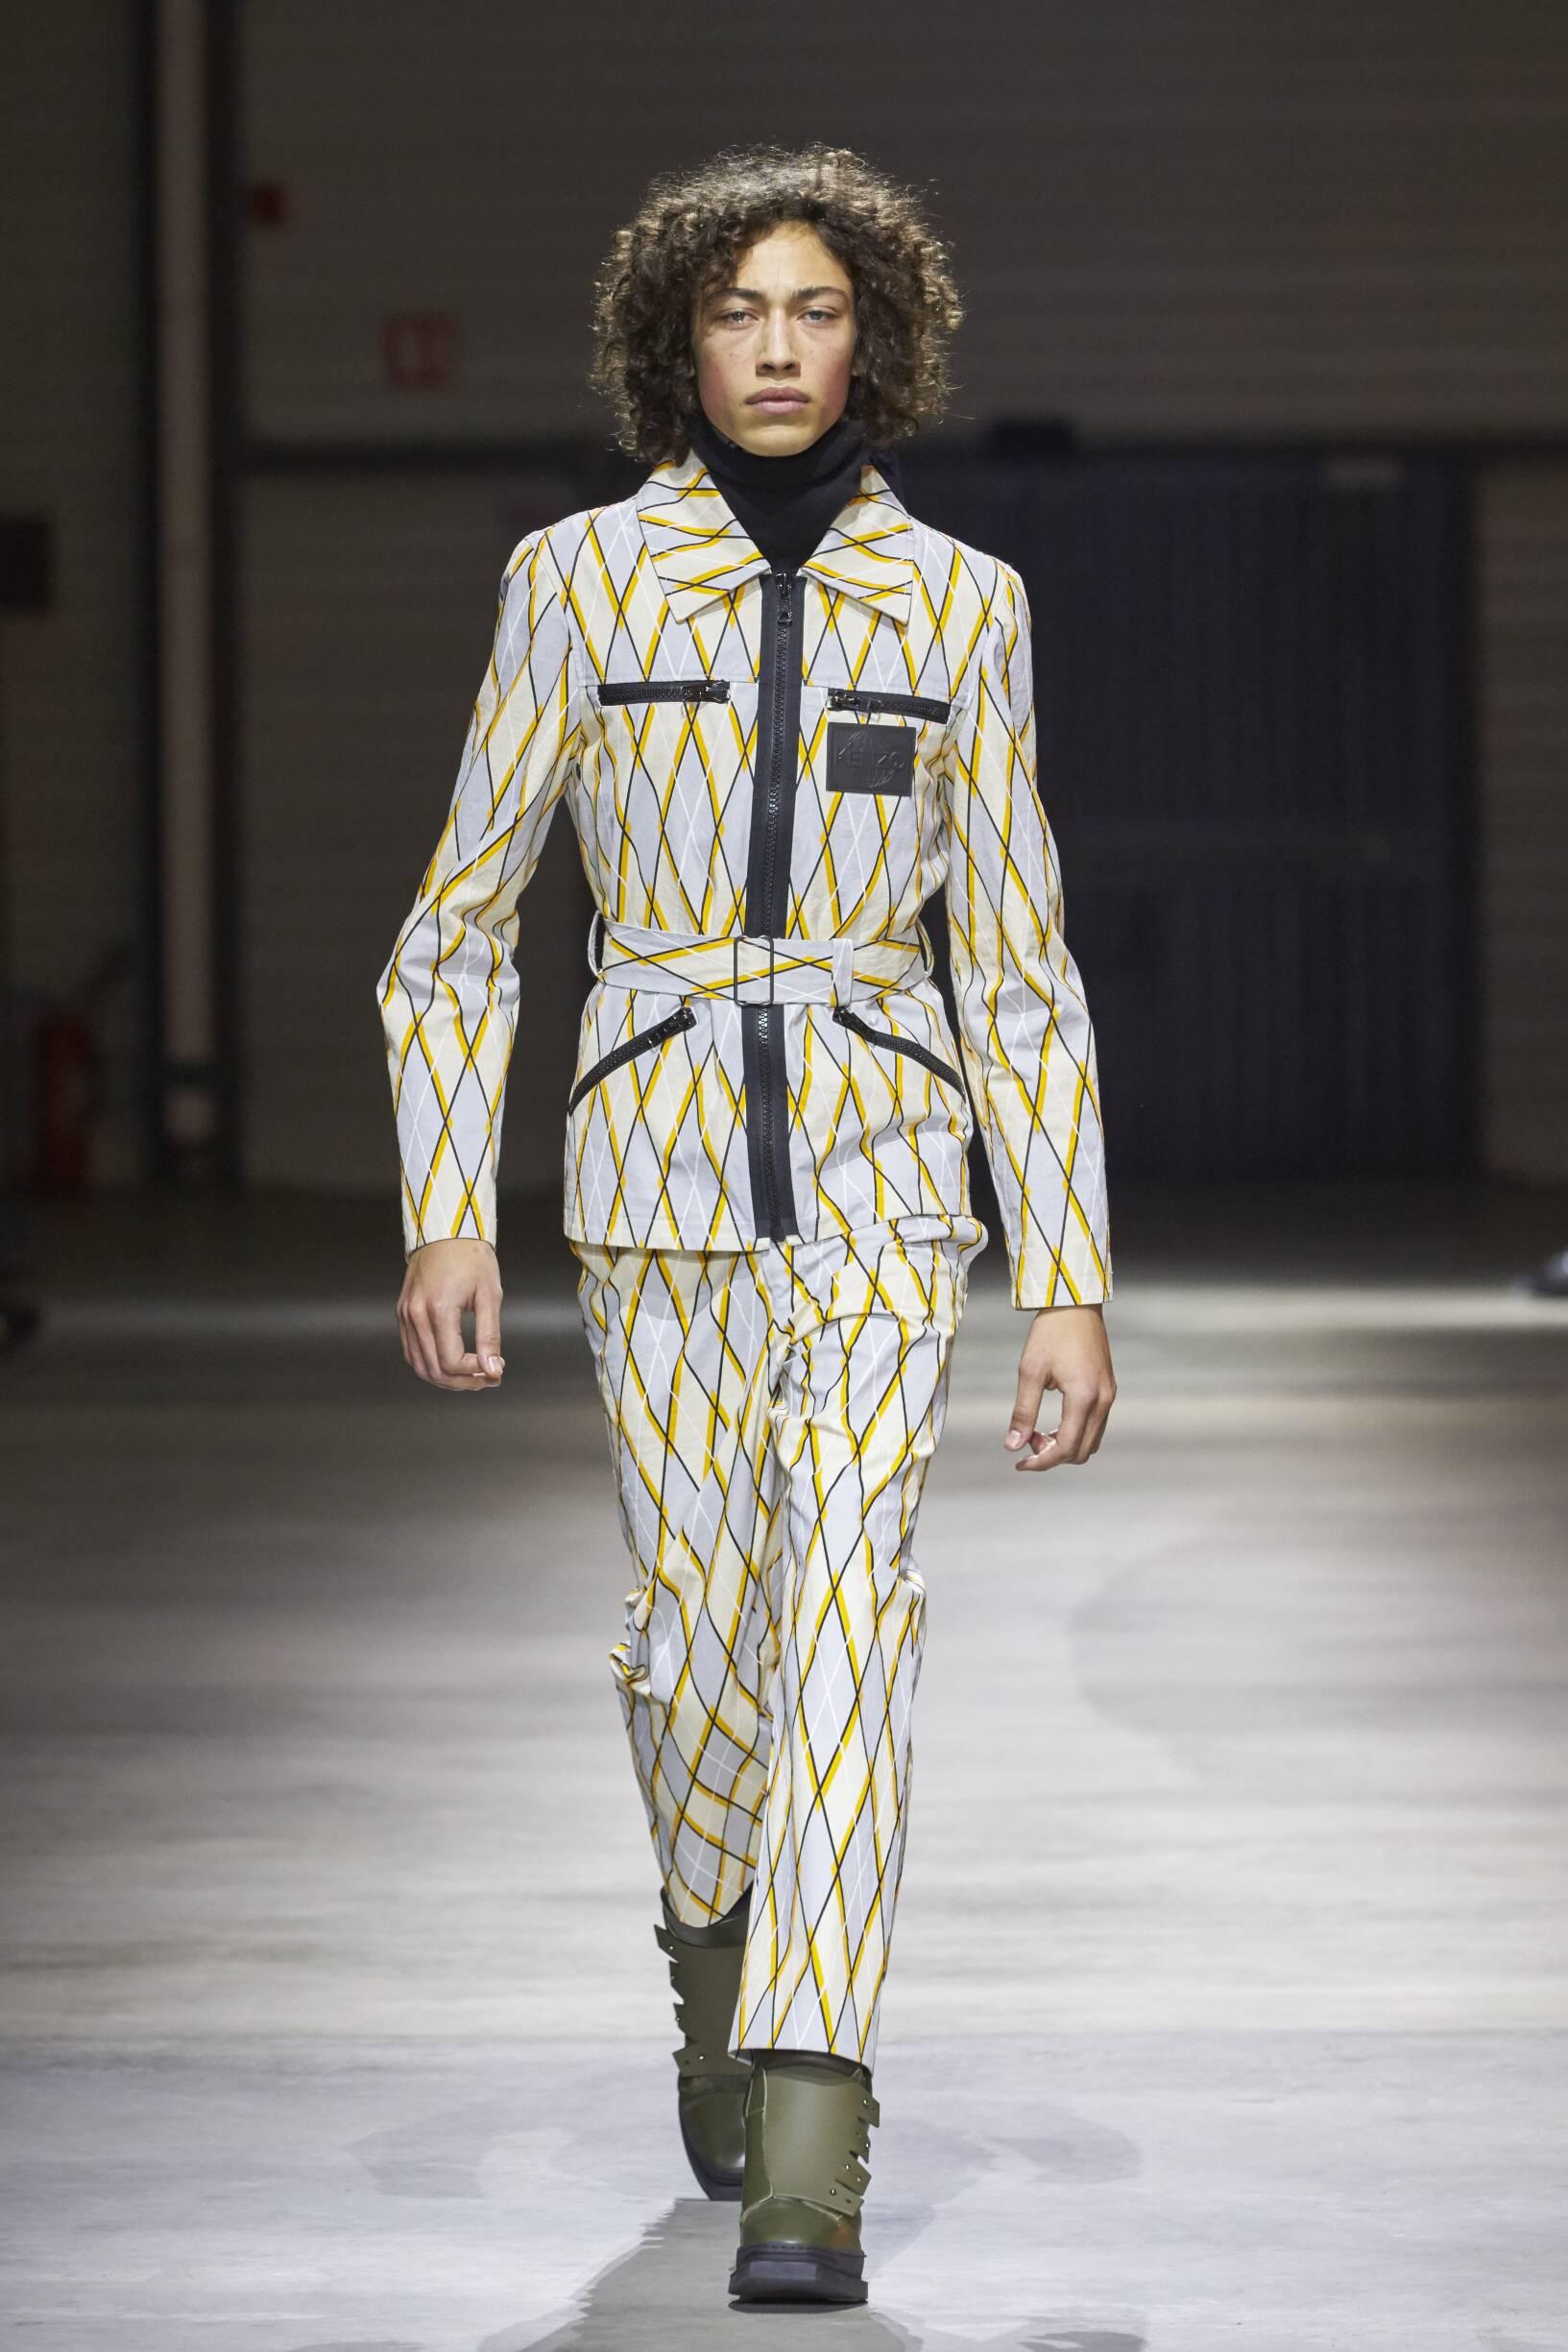 Runway Kenzo Fall Winter 2017 Men's Collection Paris Fashion Week